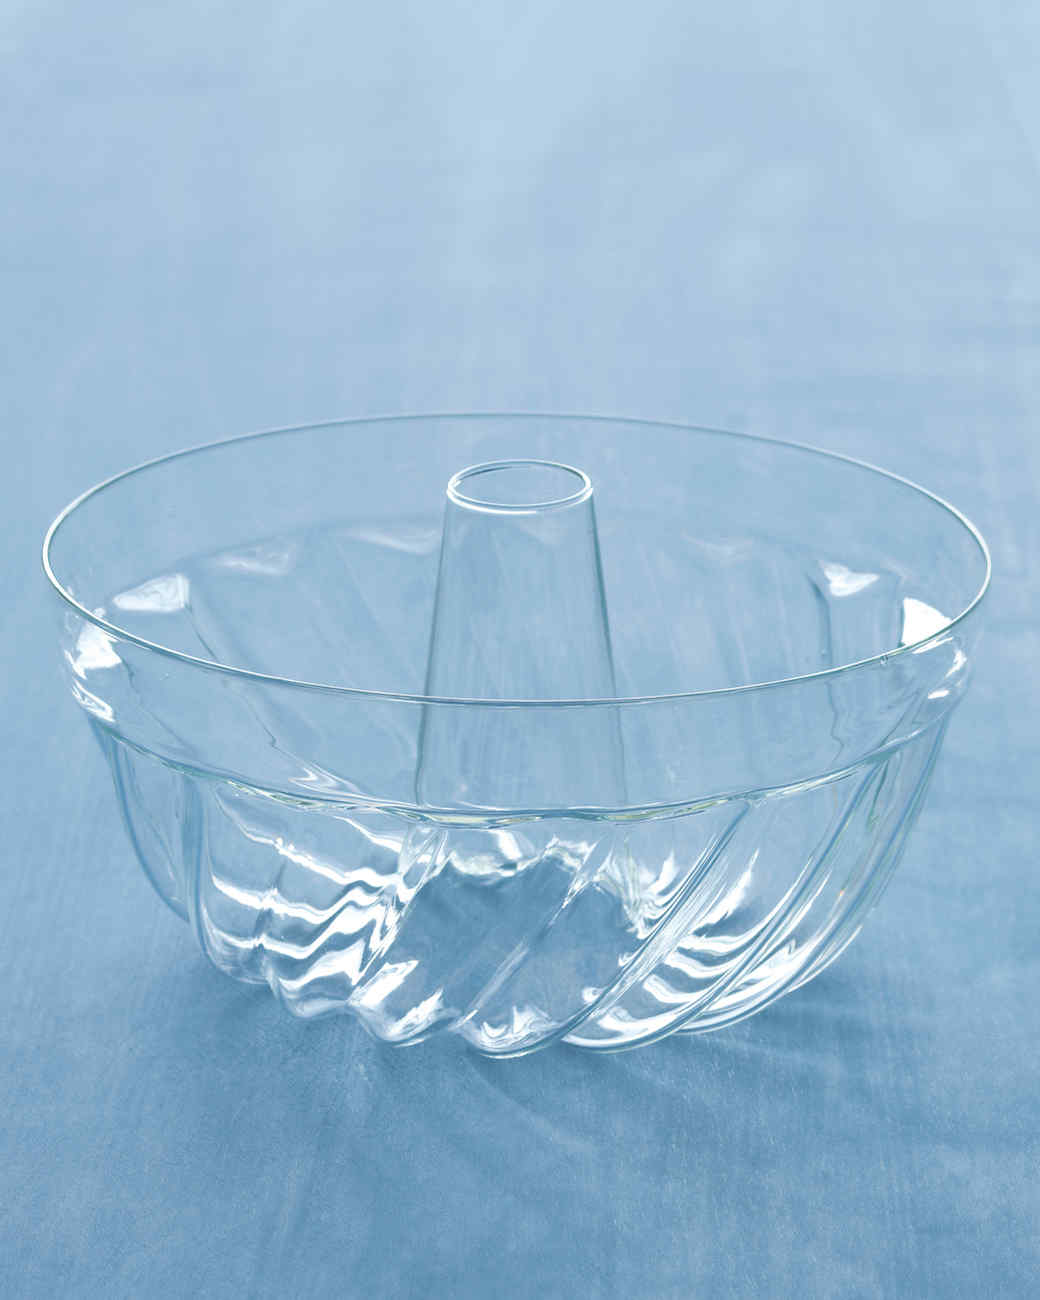 glass-cake-mold-md108967.jpg